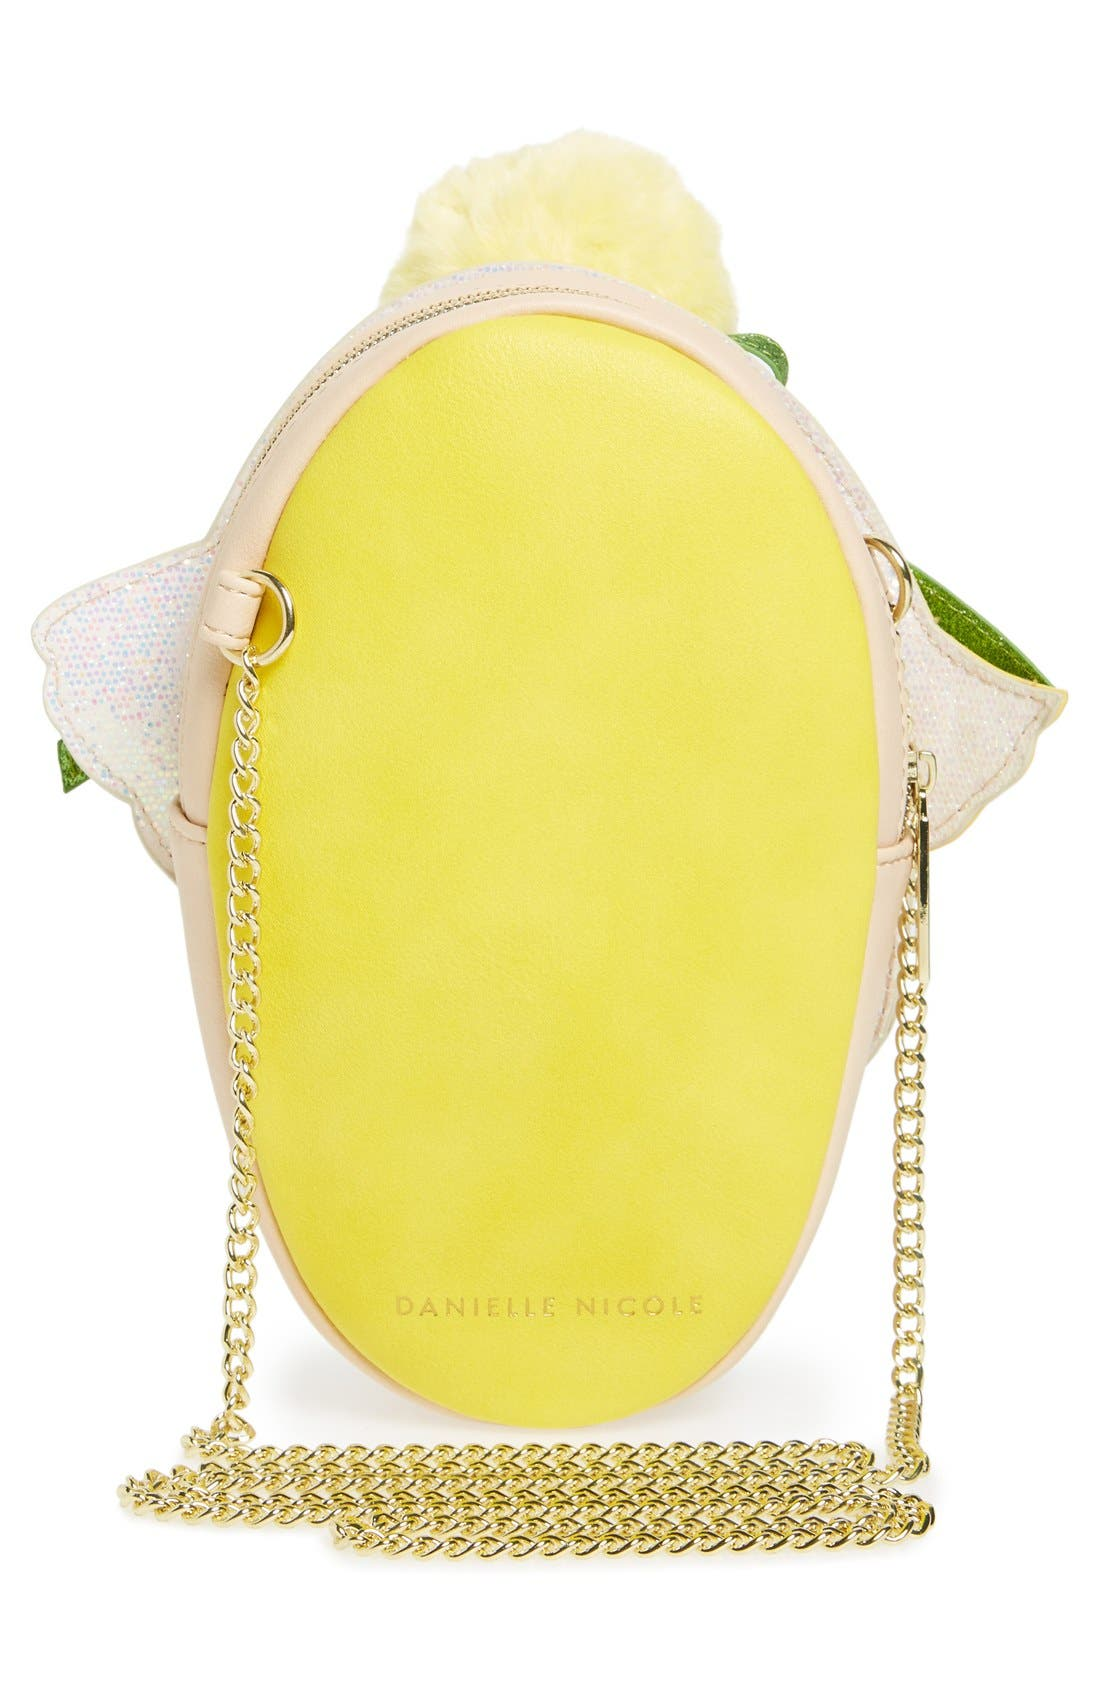 Alternate Image 2  - Danielle Nicole x Disney® Tinker Bell Faux Leather Crossbody Bag